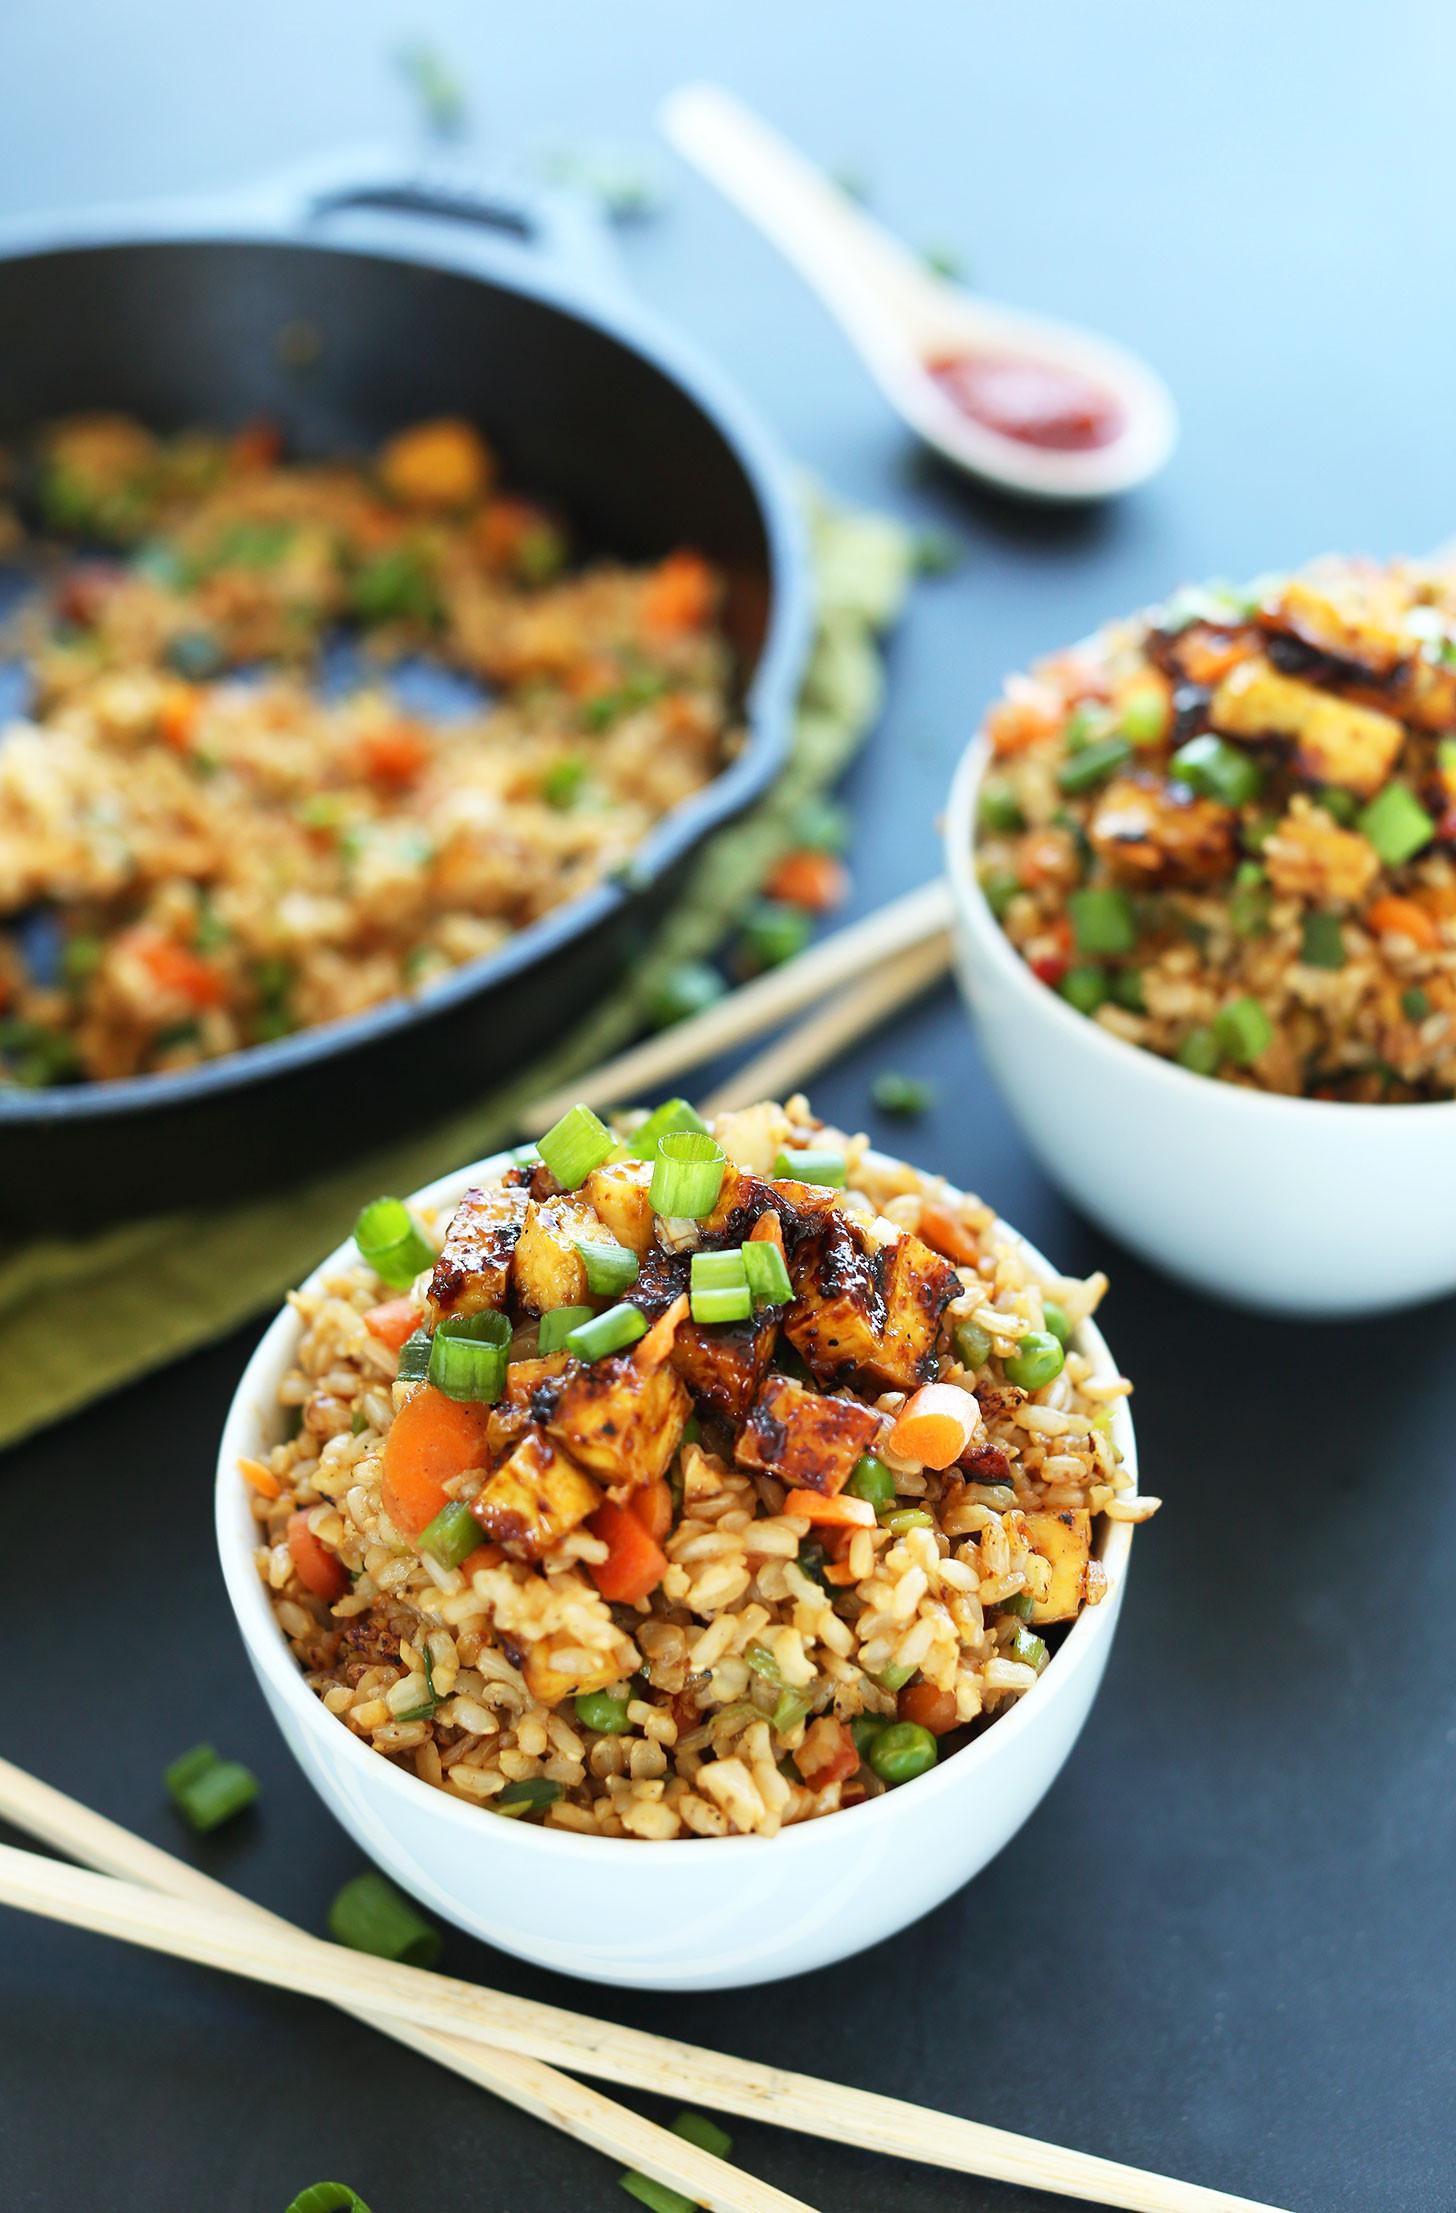 Vegan Recipes Healthy  ve arian recipes easy